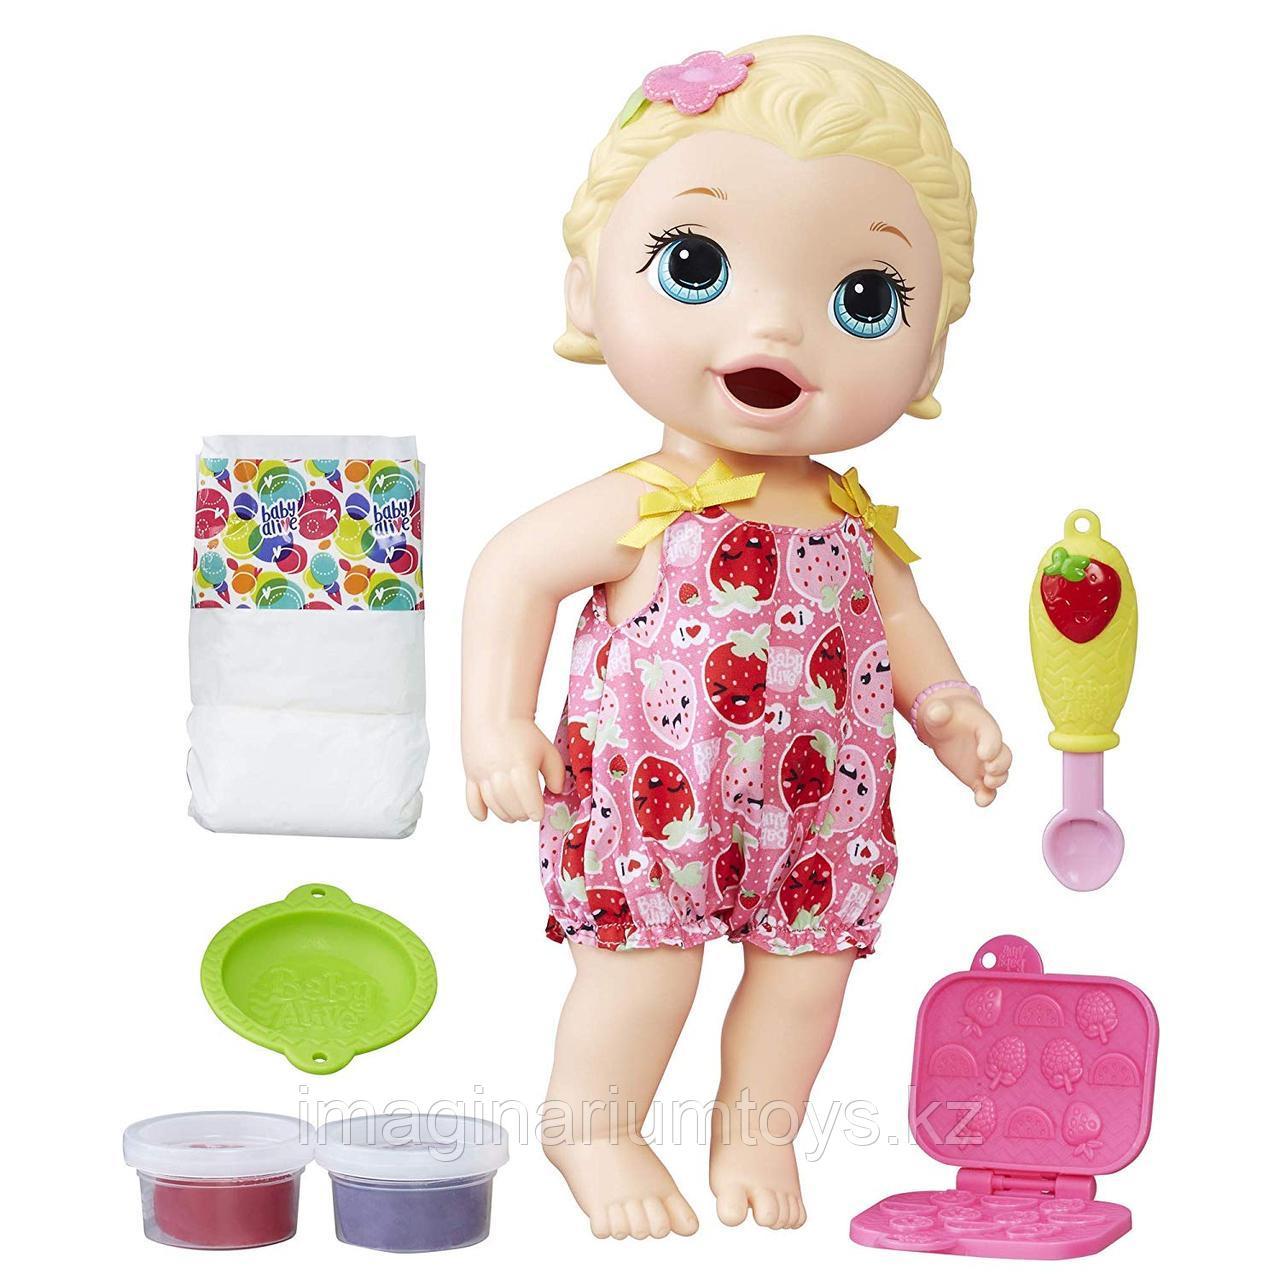 Интерактивная кукла Baby Alive блондинка